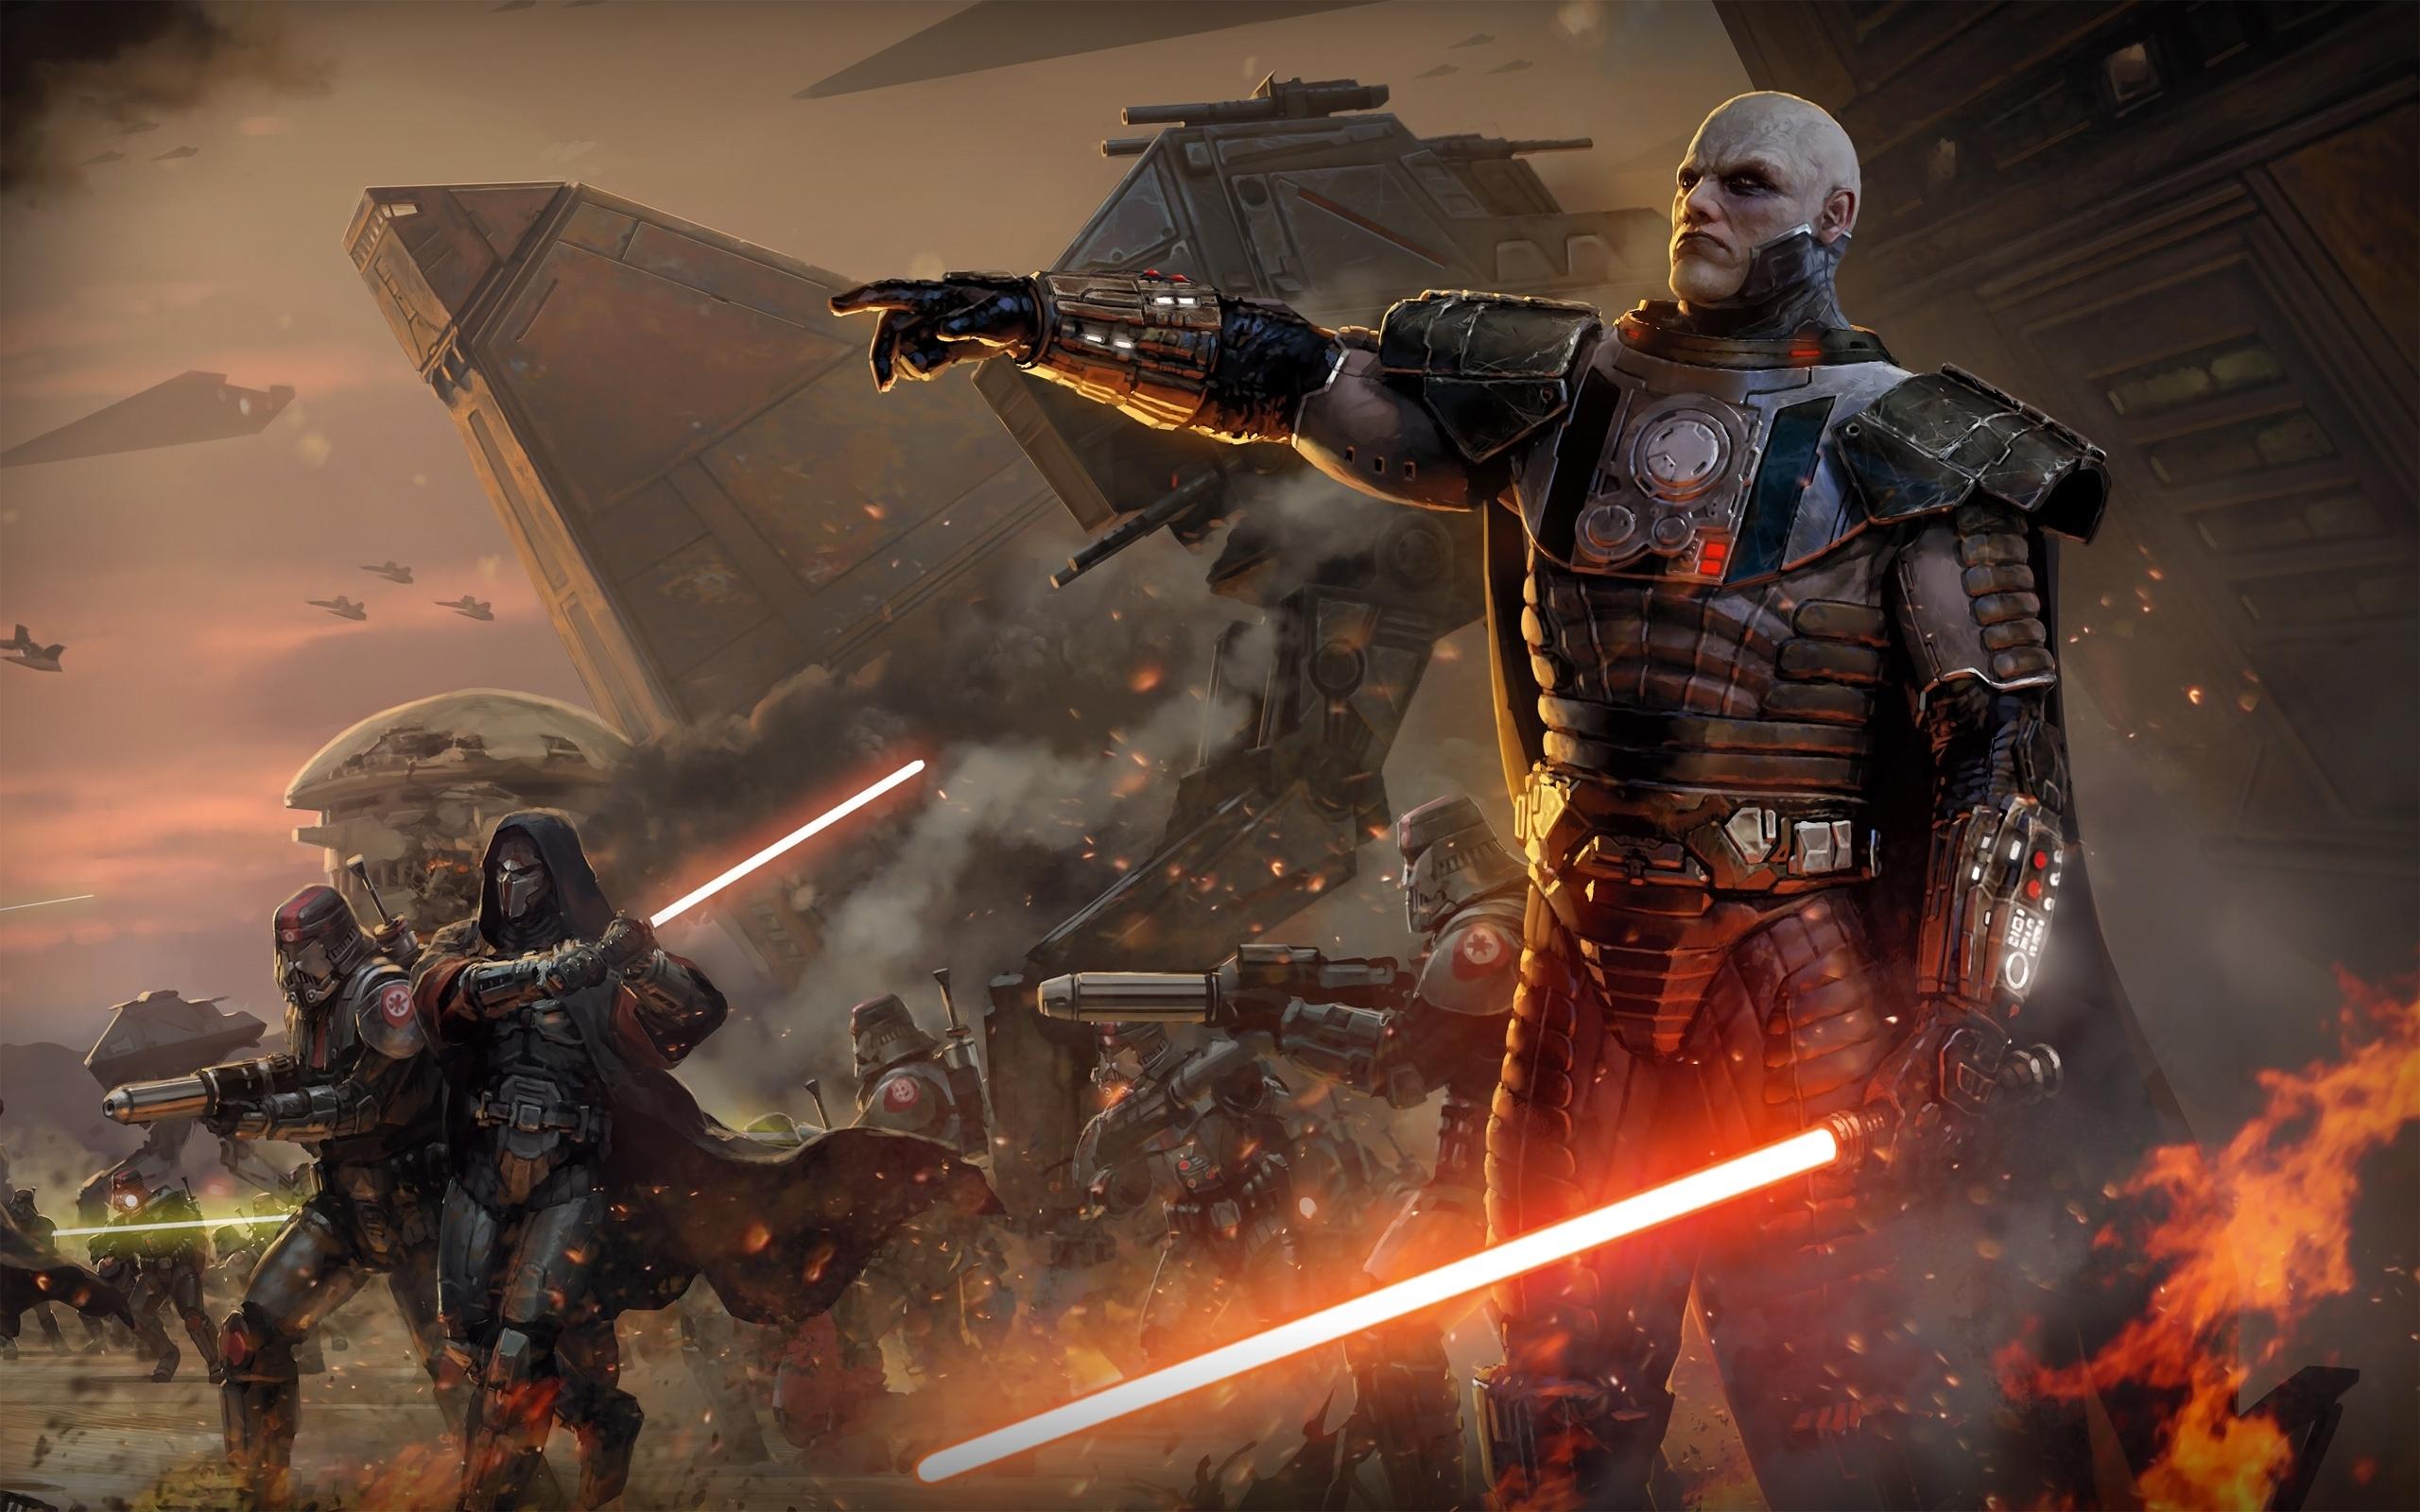 star wars: the old republic full hd fond d'écran and arrière-plan